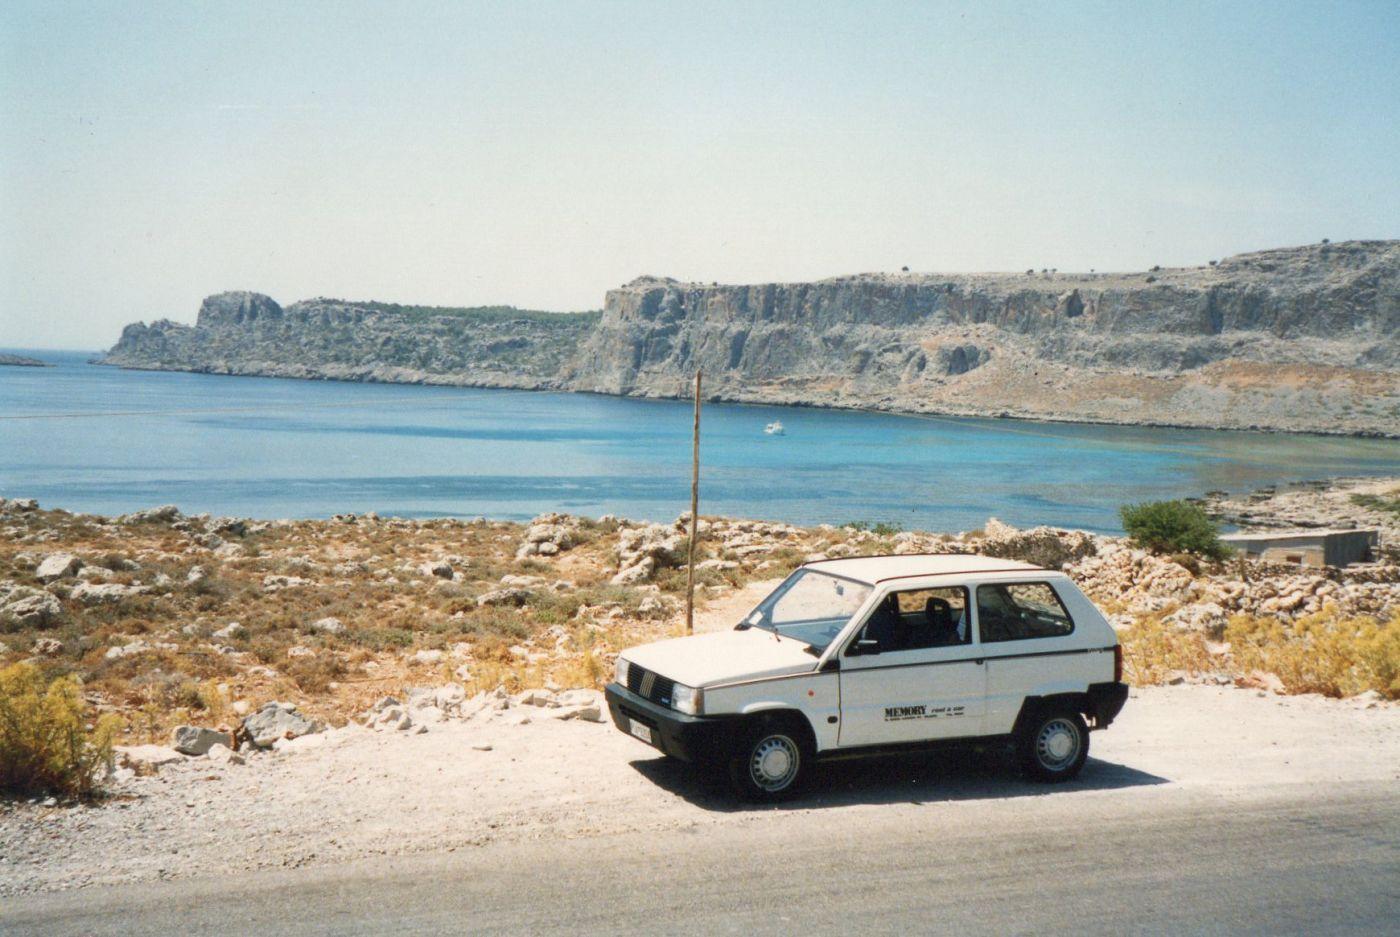 Weymouth, England, 1990 - Fiat Panda 750, foto di Andrew Bone, CC BY 2.0, via Wikimedia Commons